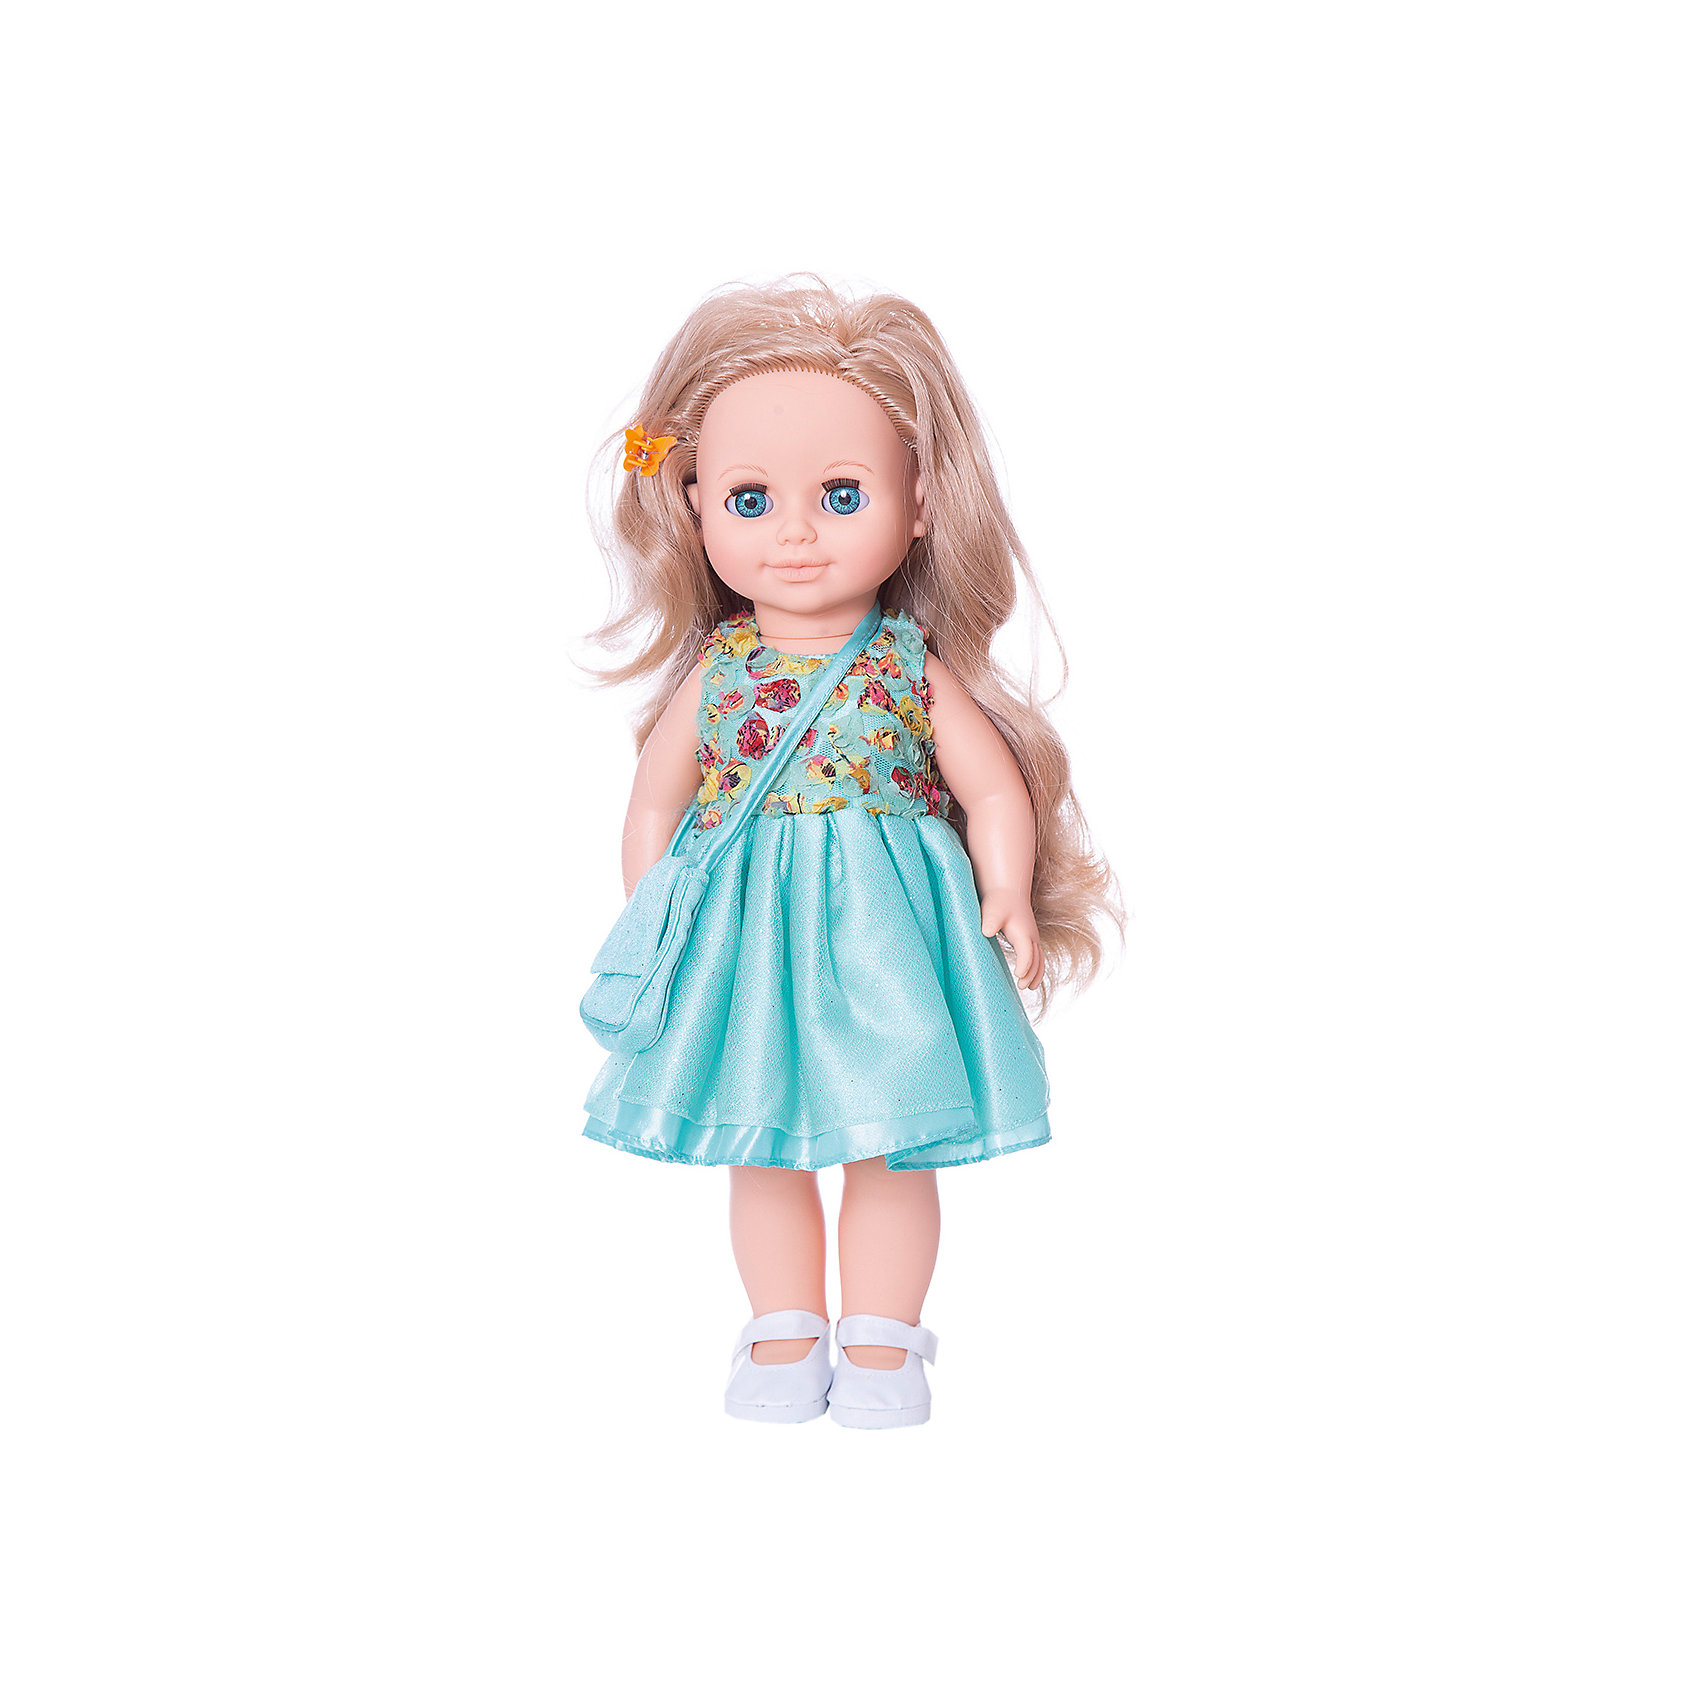 Кукла Анна 17, со звуком, Весна<br><br>Ширина мм: 490<br>Глубина мм: 210<br>Высота мм: 130<br>Вес г: 550<br>Возраст от месяцев: 36<br>Возраст до месяцев: 144<br>Пол: Женский<br>Возраст: Детский<br>SKU: 4896505